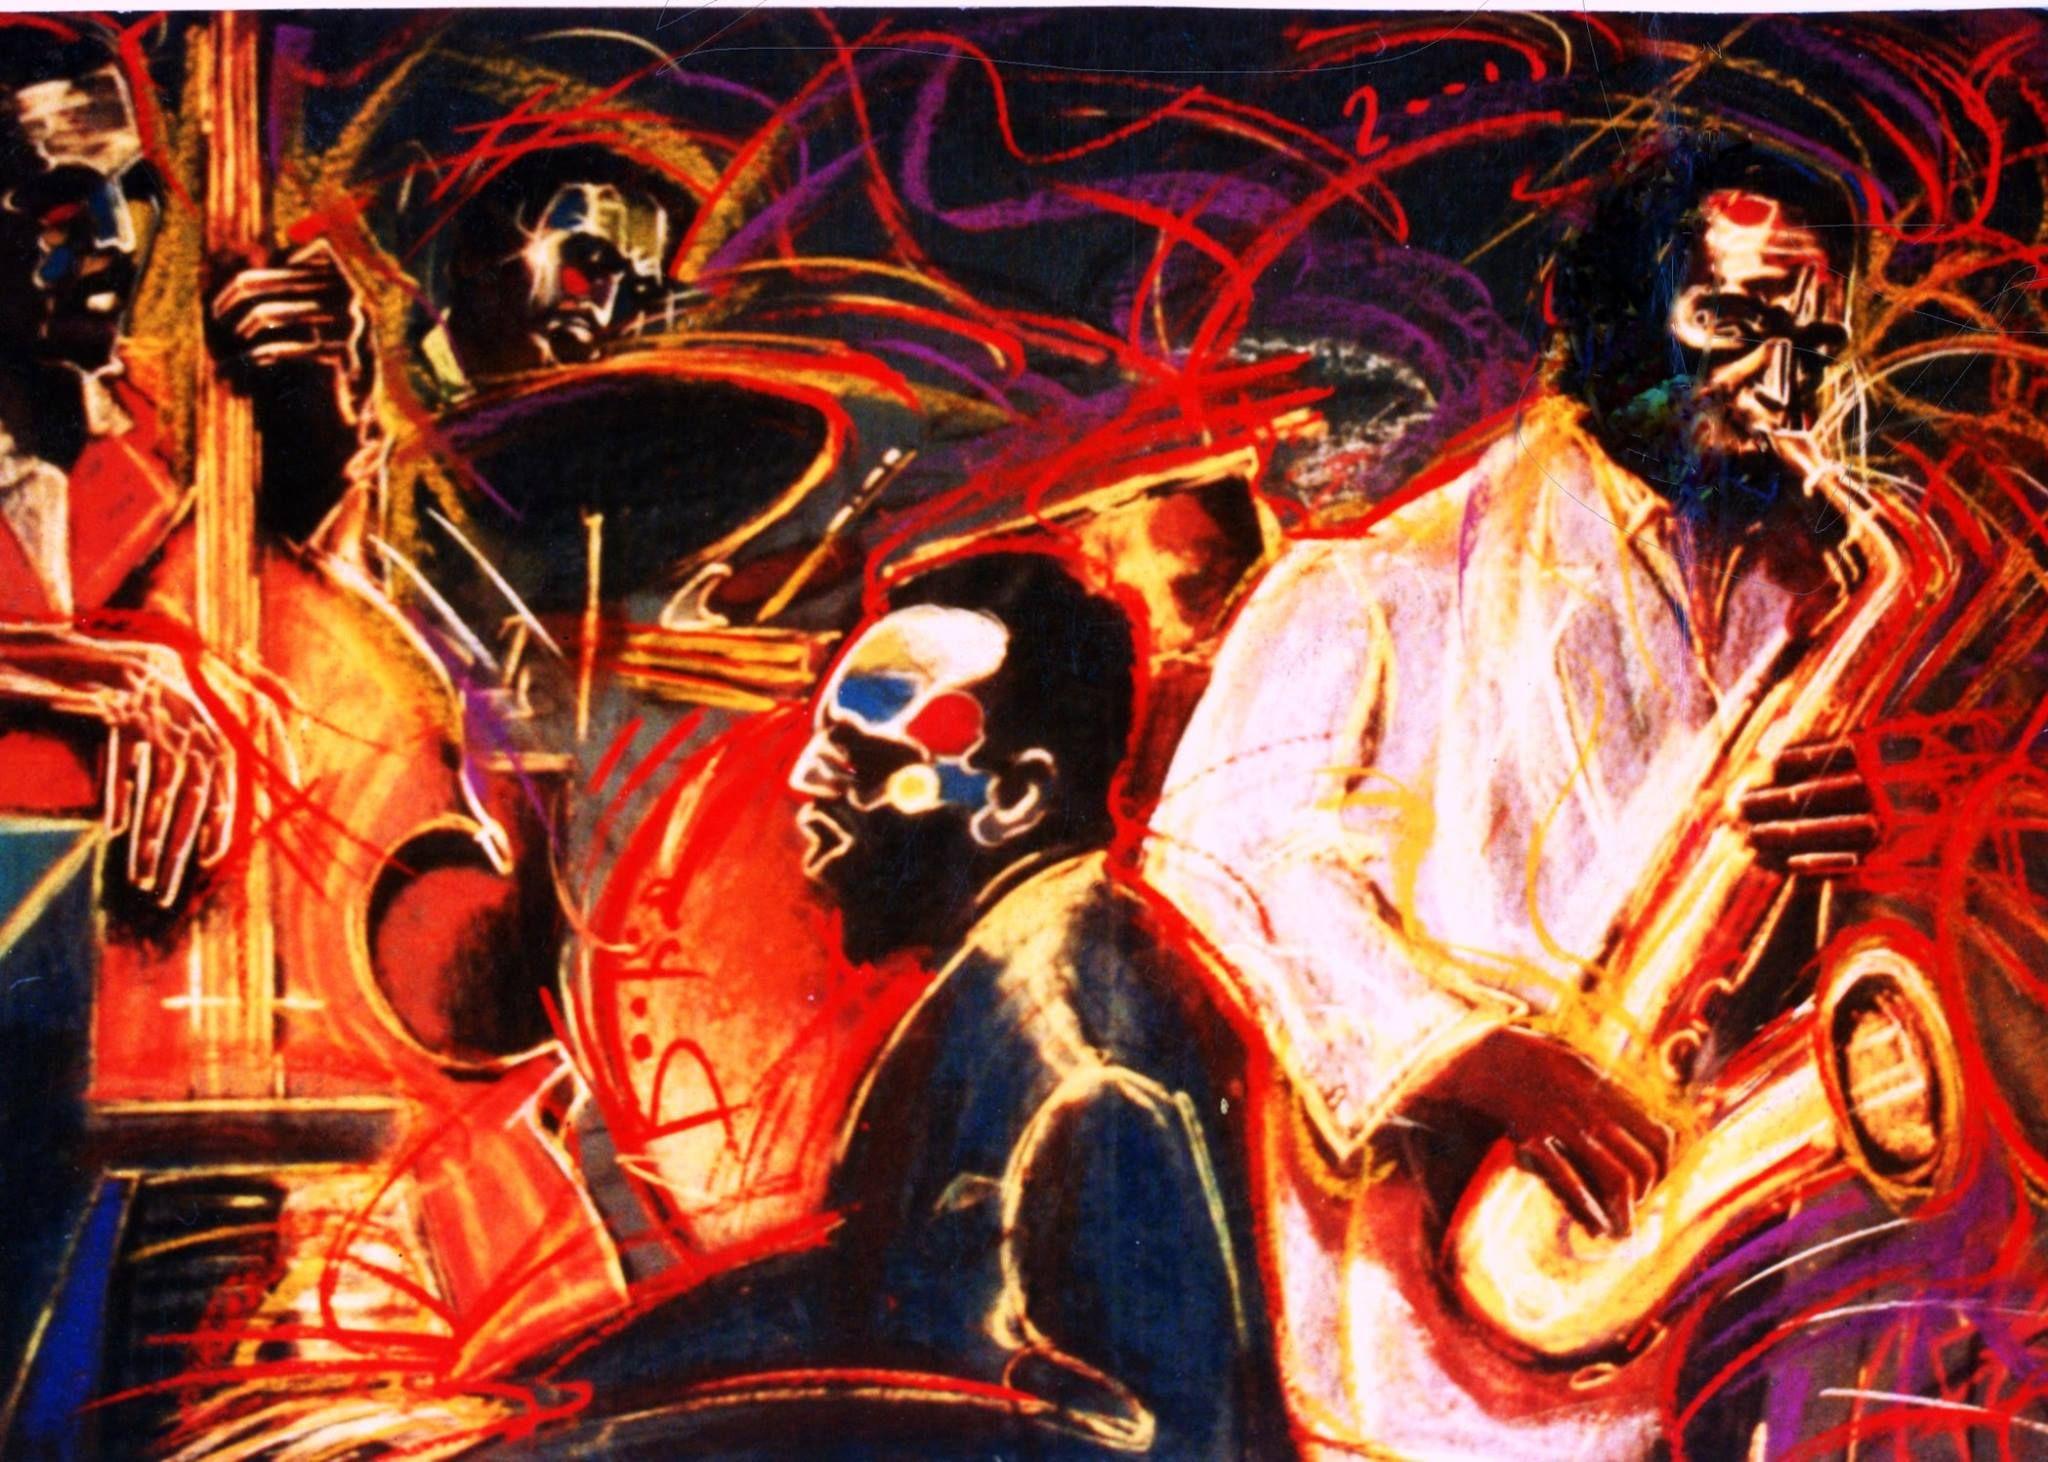 Barry boobis new orleans quartet artwork painting